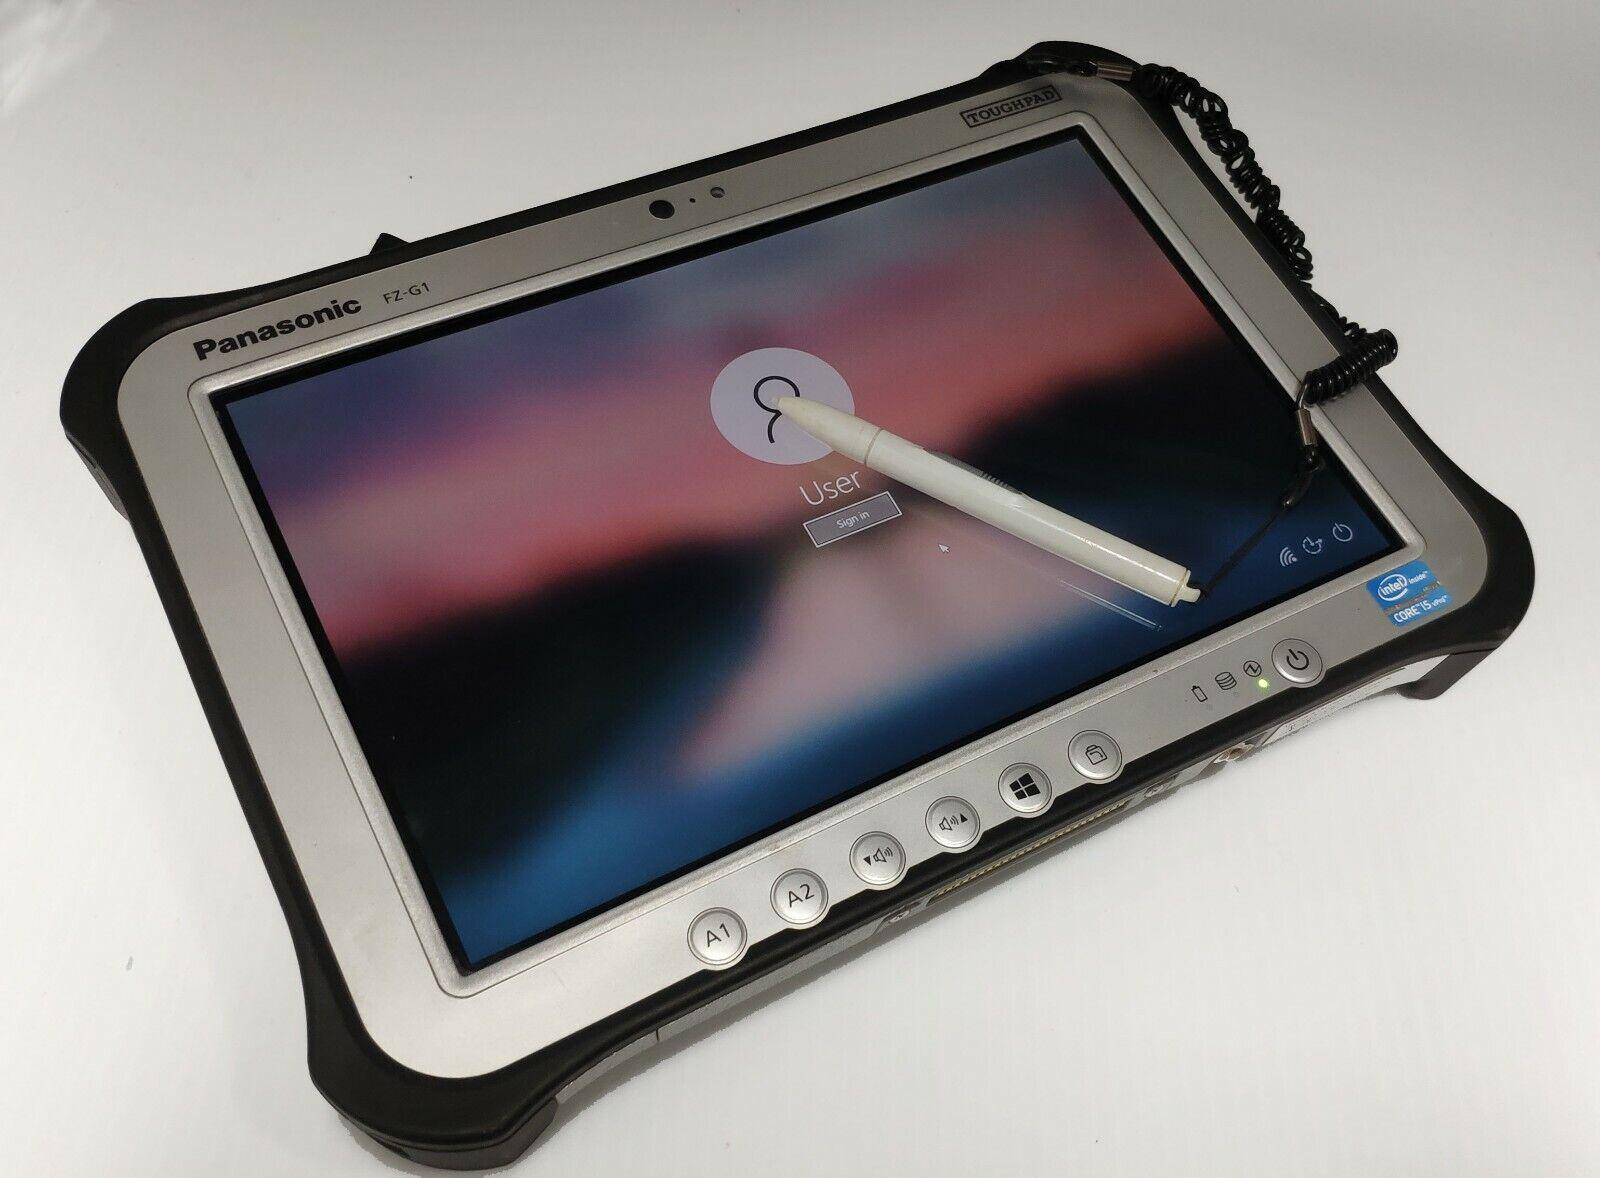 Laptop Windows - Panasonic toughpad windows 10 rugged tablet waterproof i5 8GB